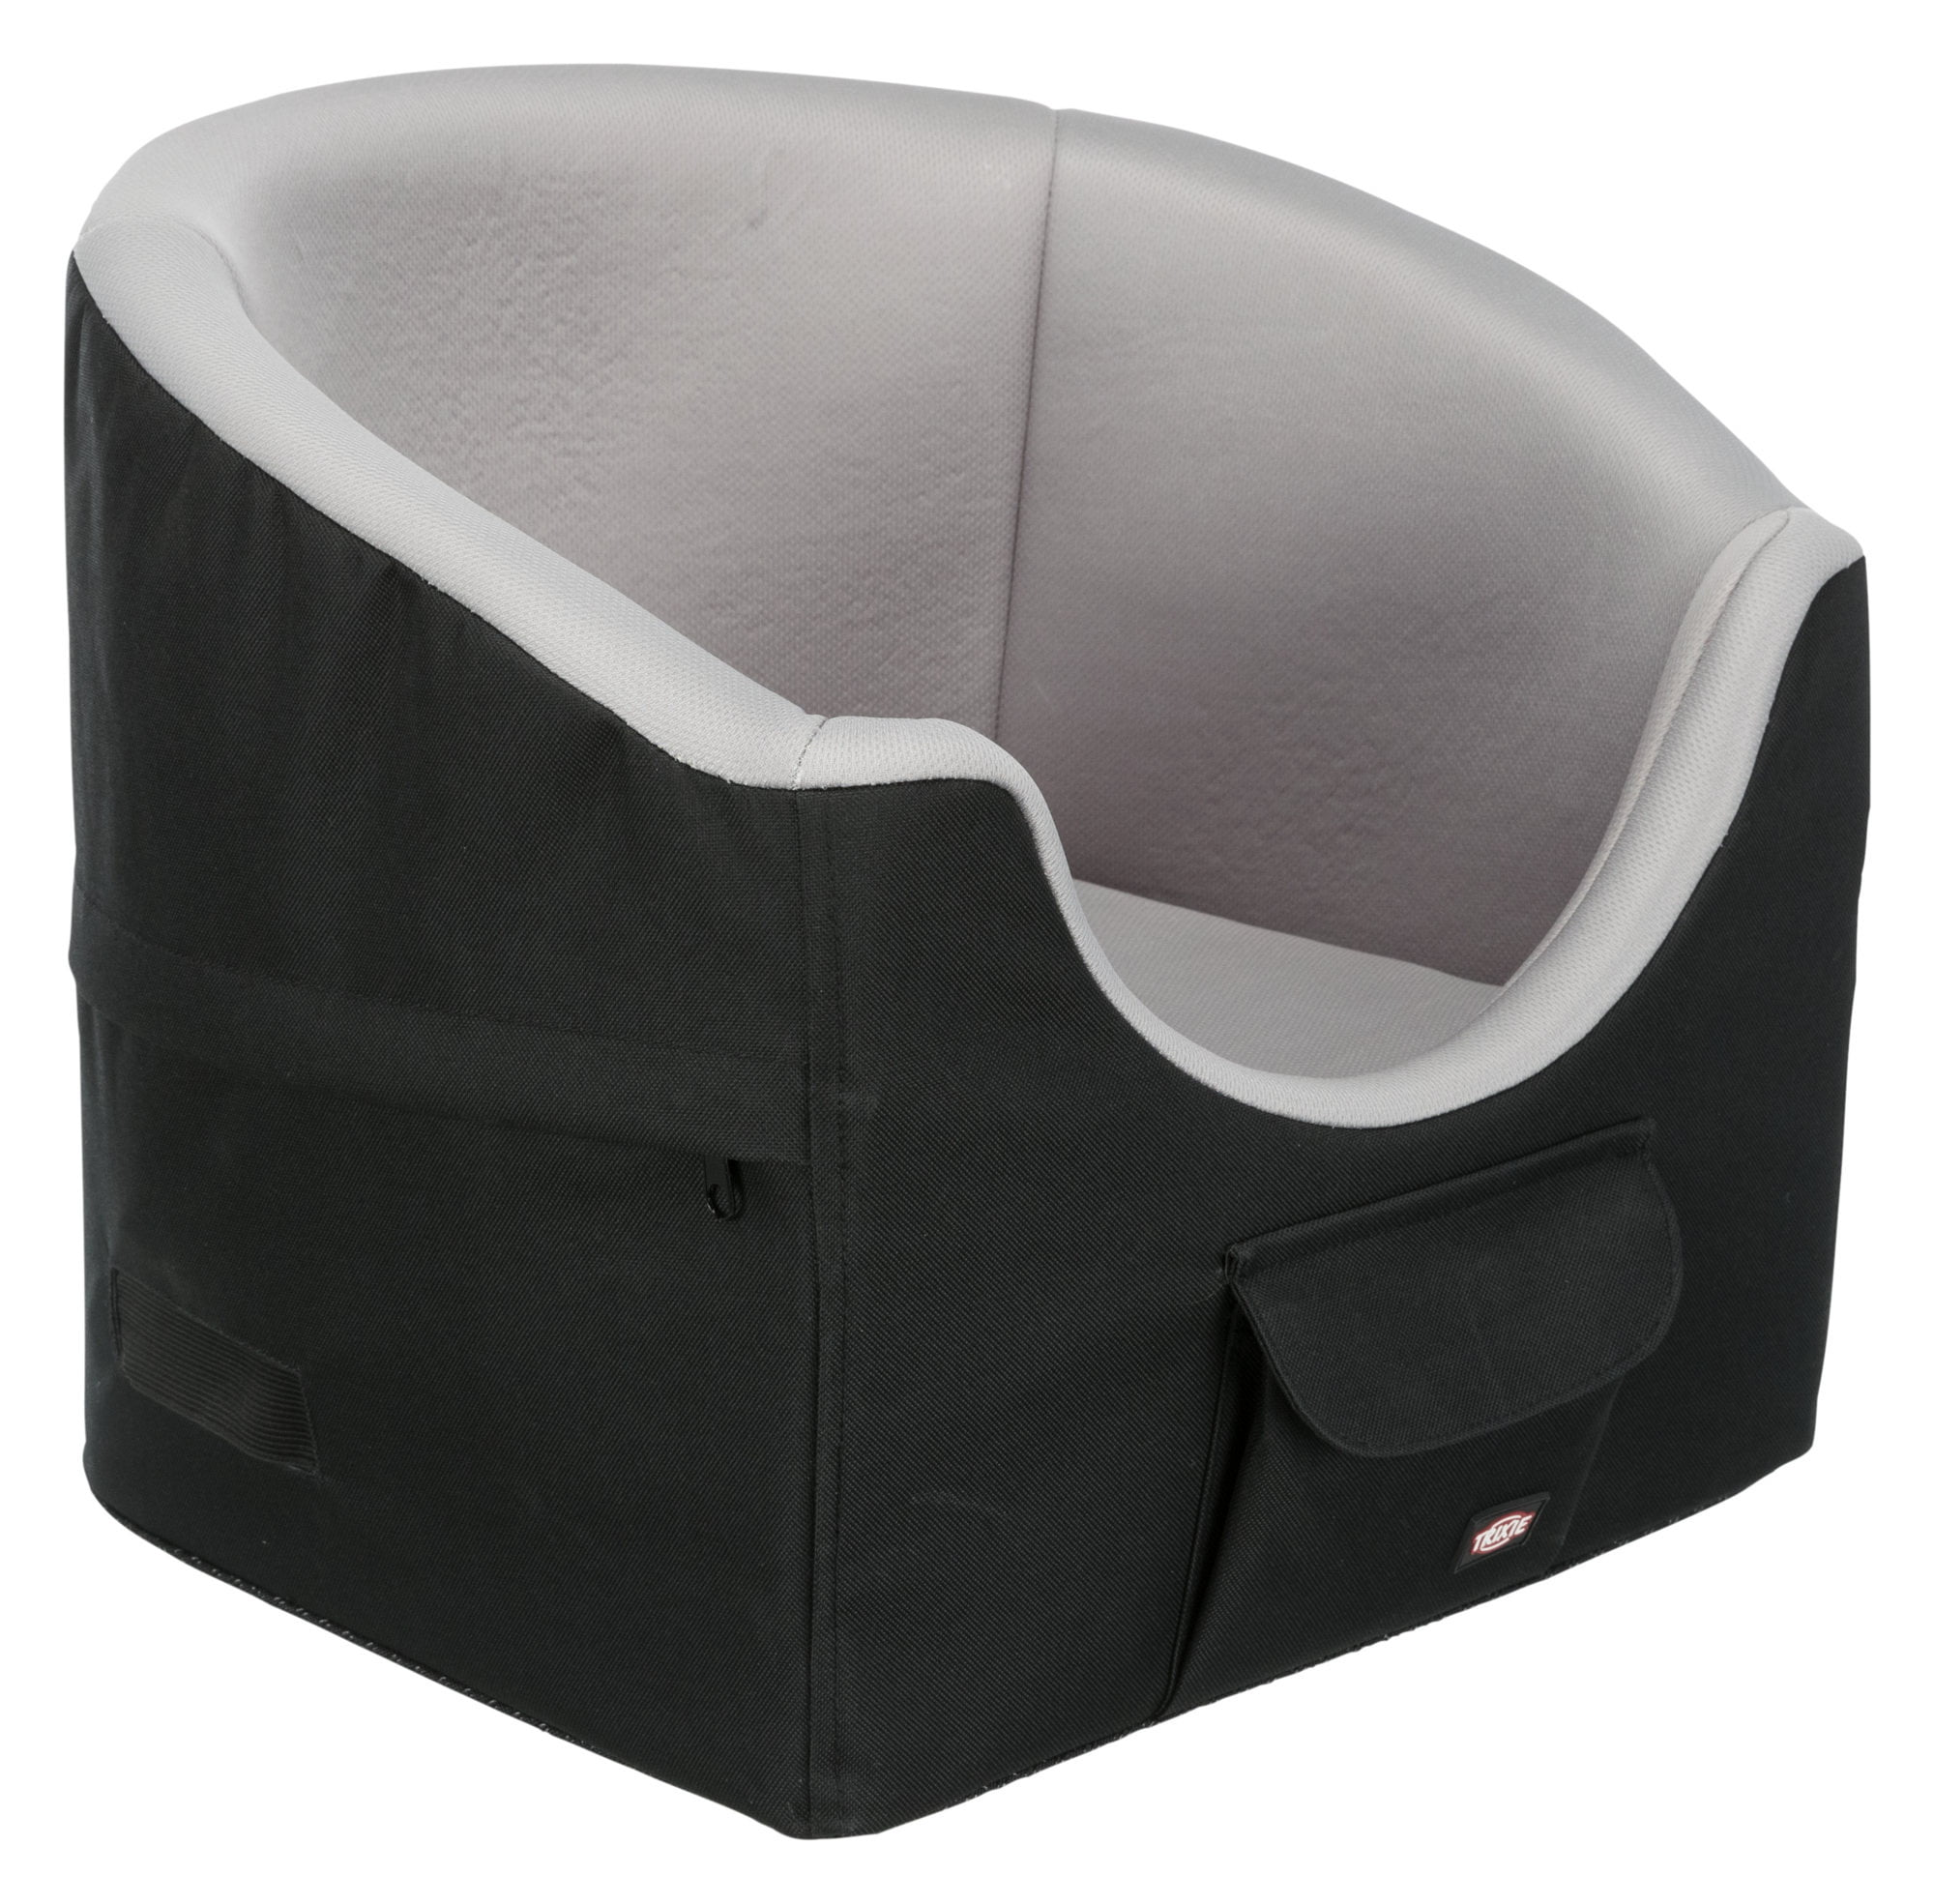 Trixie autostoel Afmetingen: 45 × 39 × 42 cm tot 8 kilo